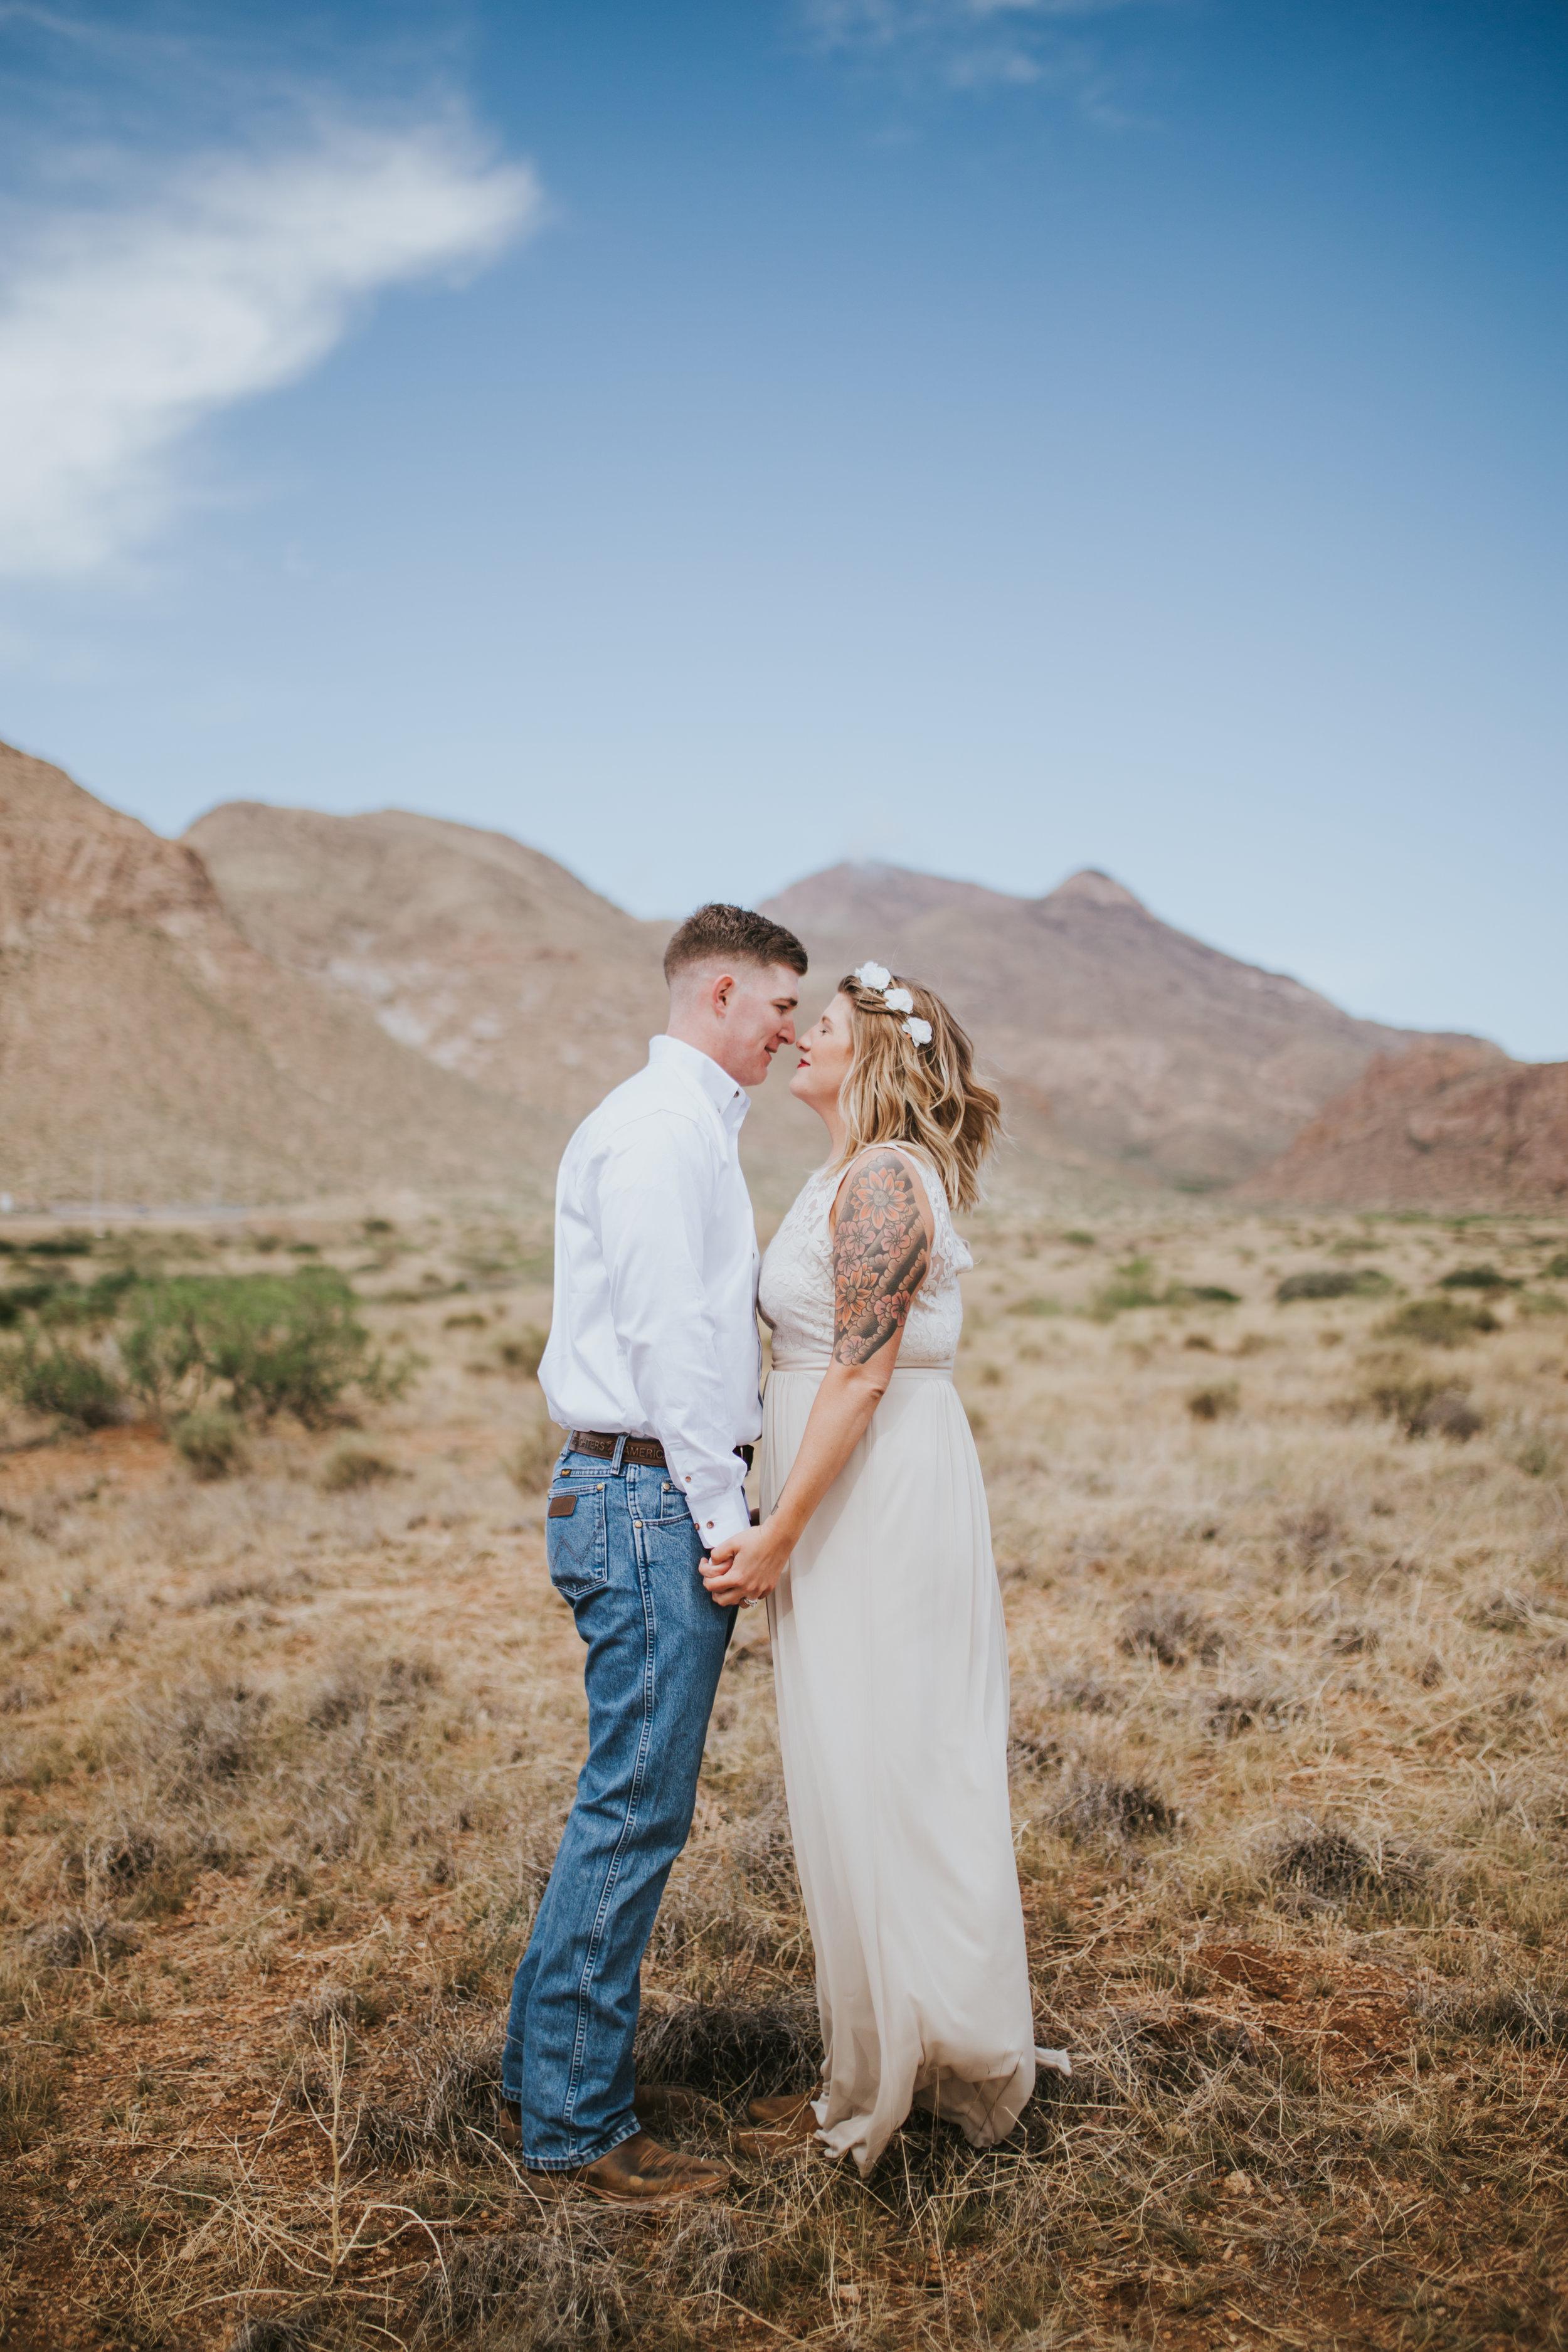 el-paso-texas-wedding-photographer-31